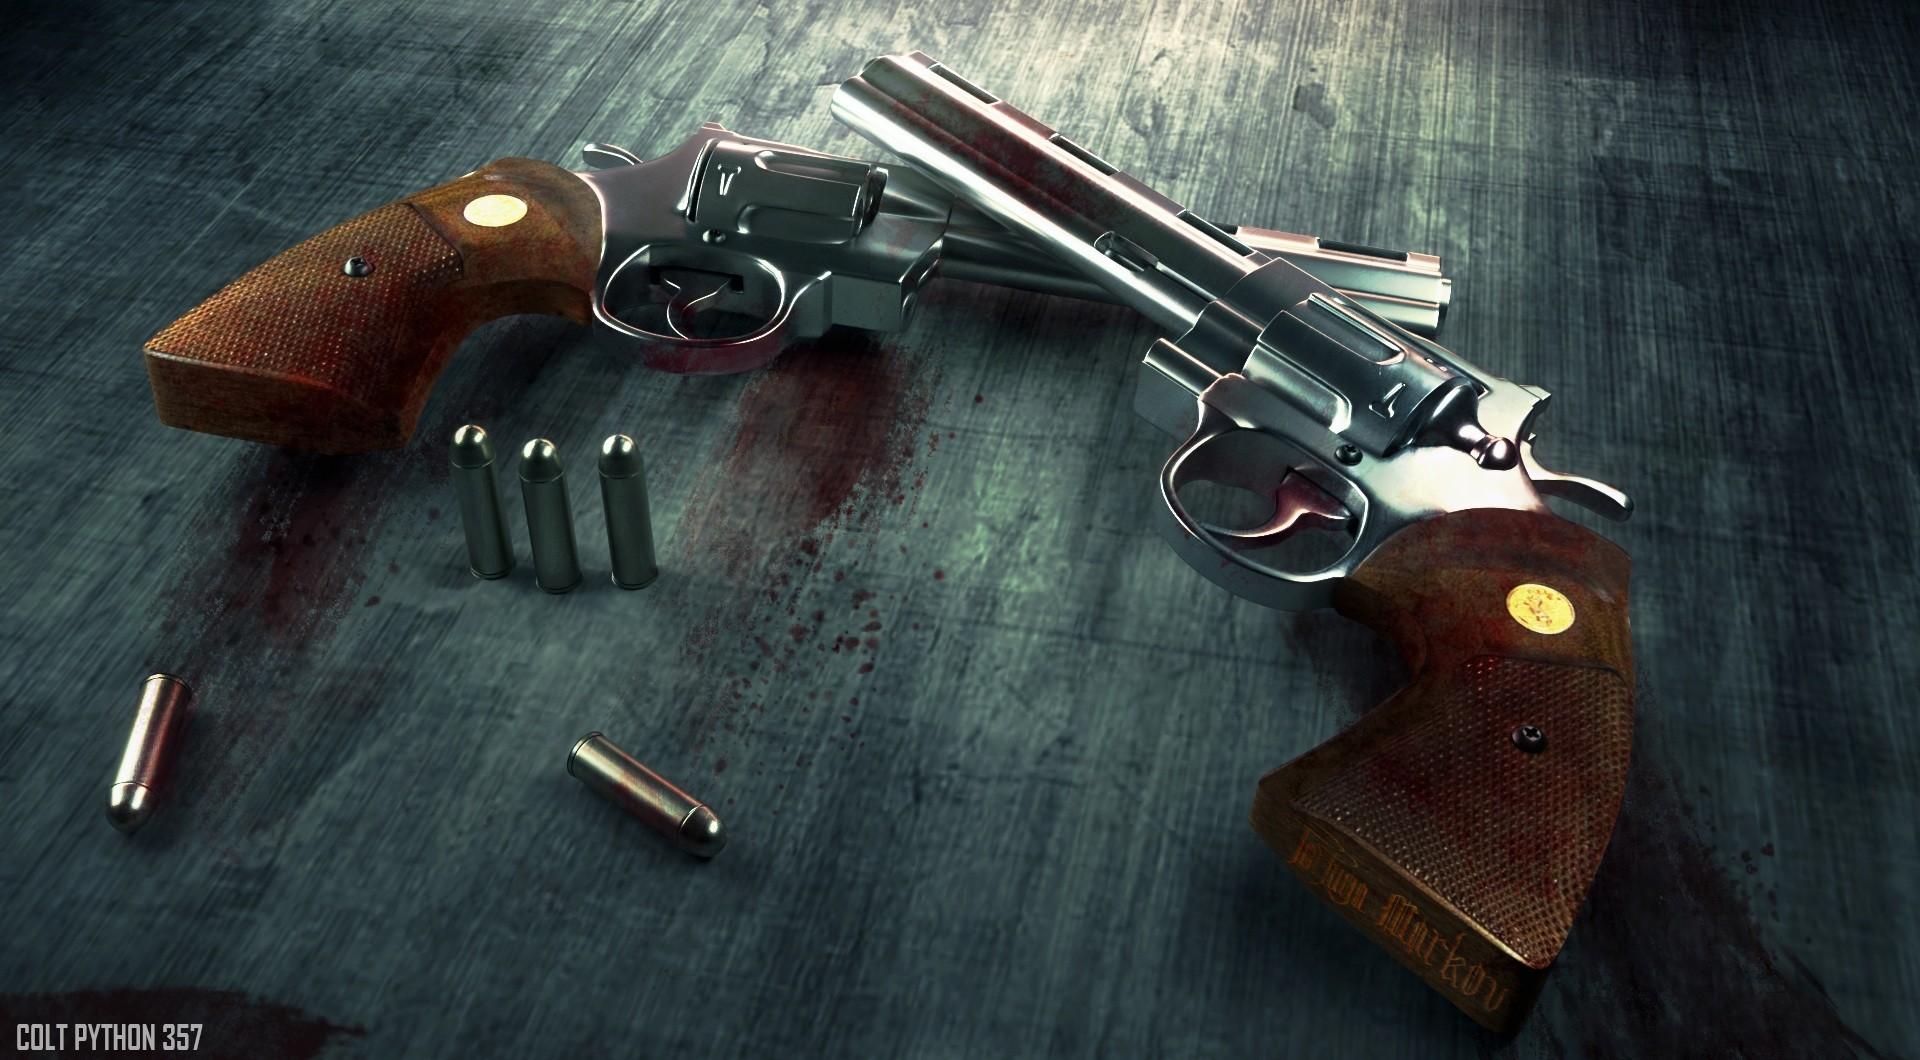 ArtStation - Colt Python 357, Tortuga Markov